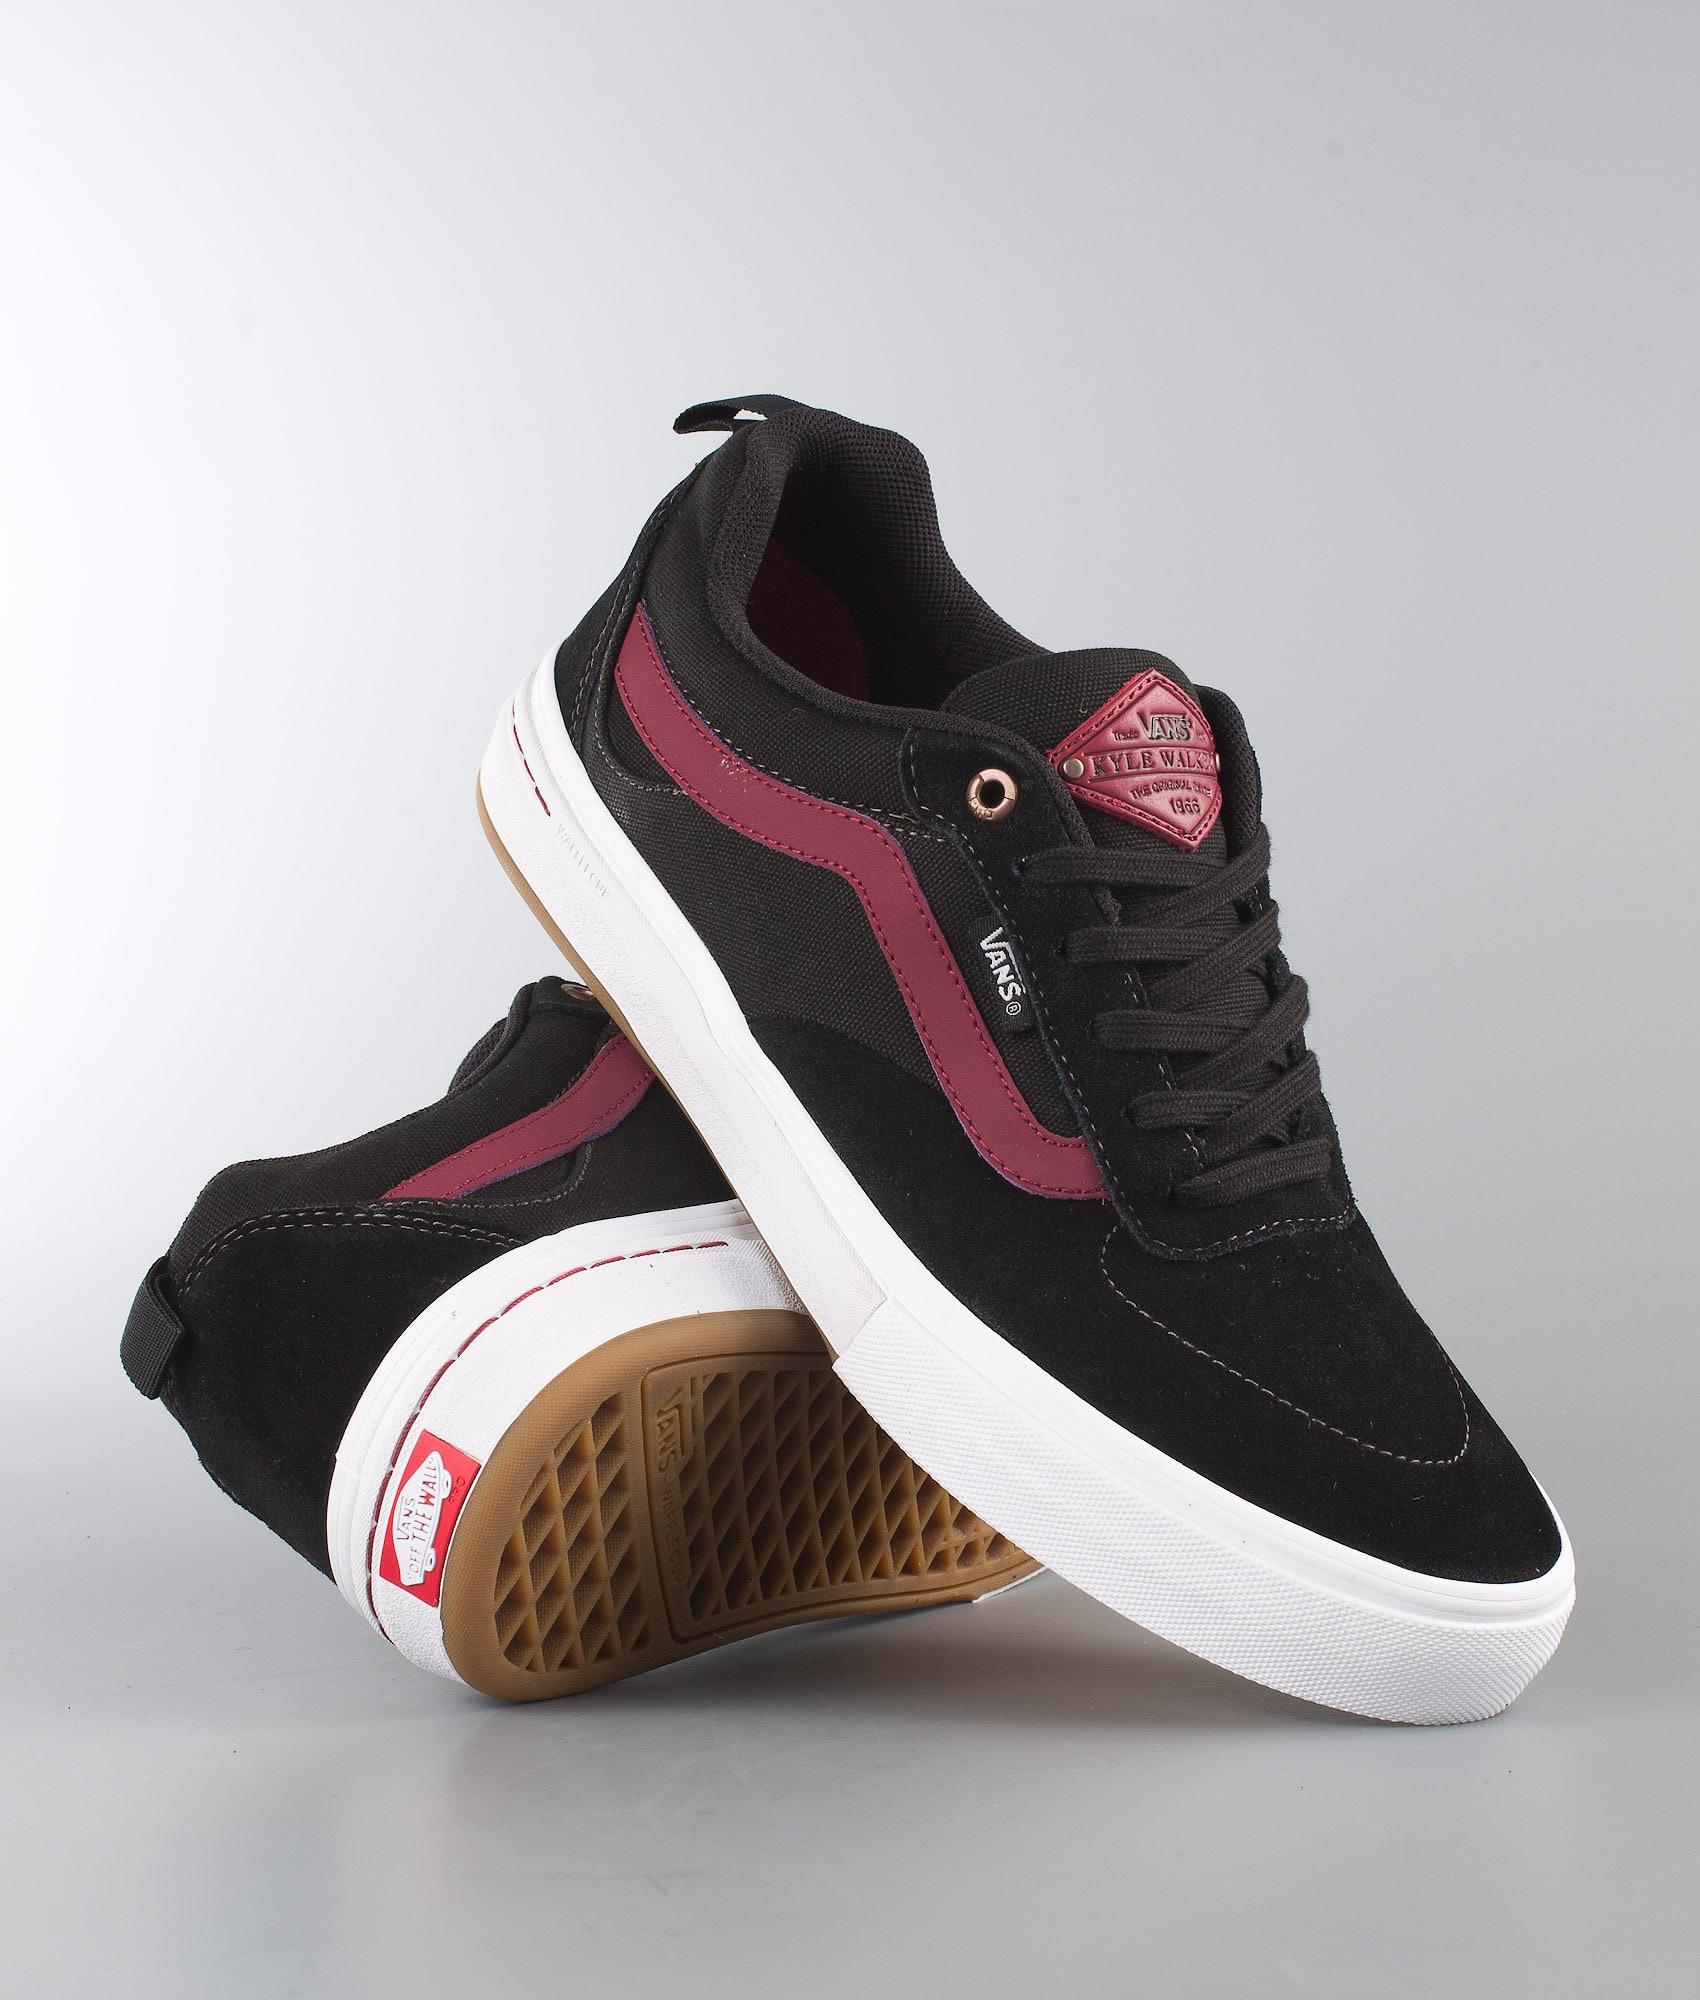 52827d8160c Vans Kyle Walker Pro Shoes Black Tibetan Red - Ridestore.com